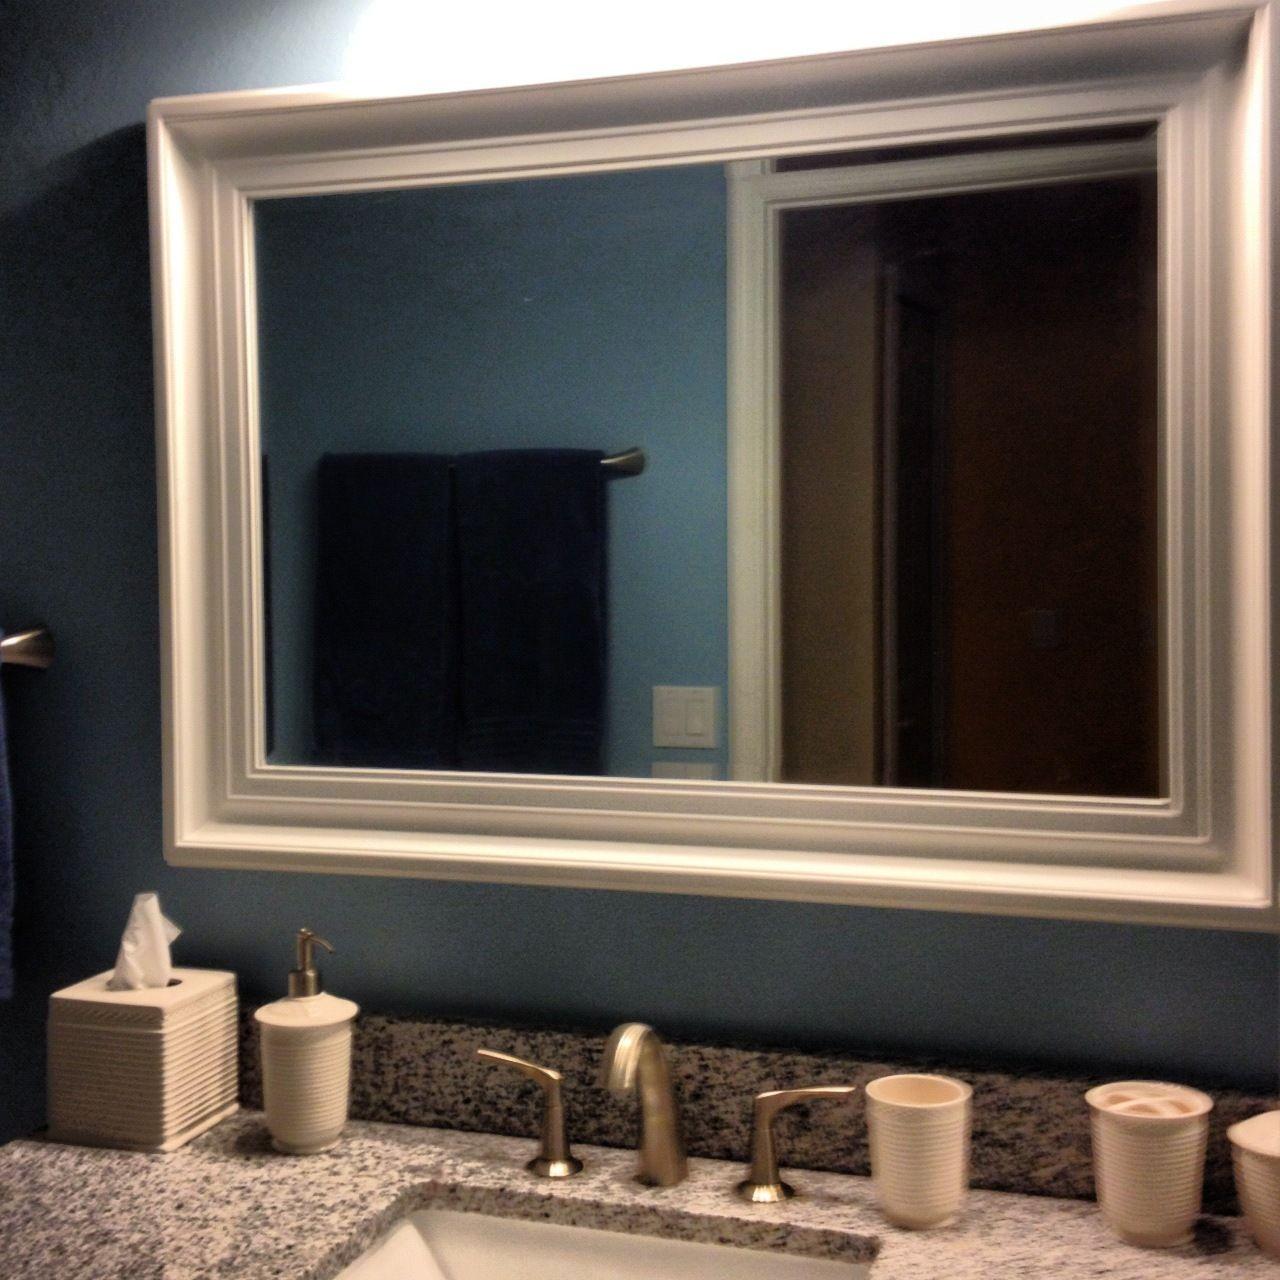 Bathroom Superb Bathroom Mirror Frames Ideas With High Class Carved Art  Along Luxury Sinks And